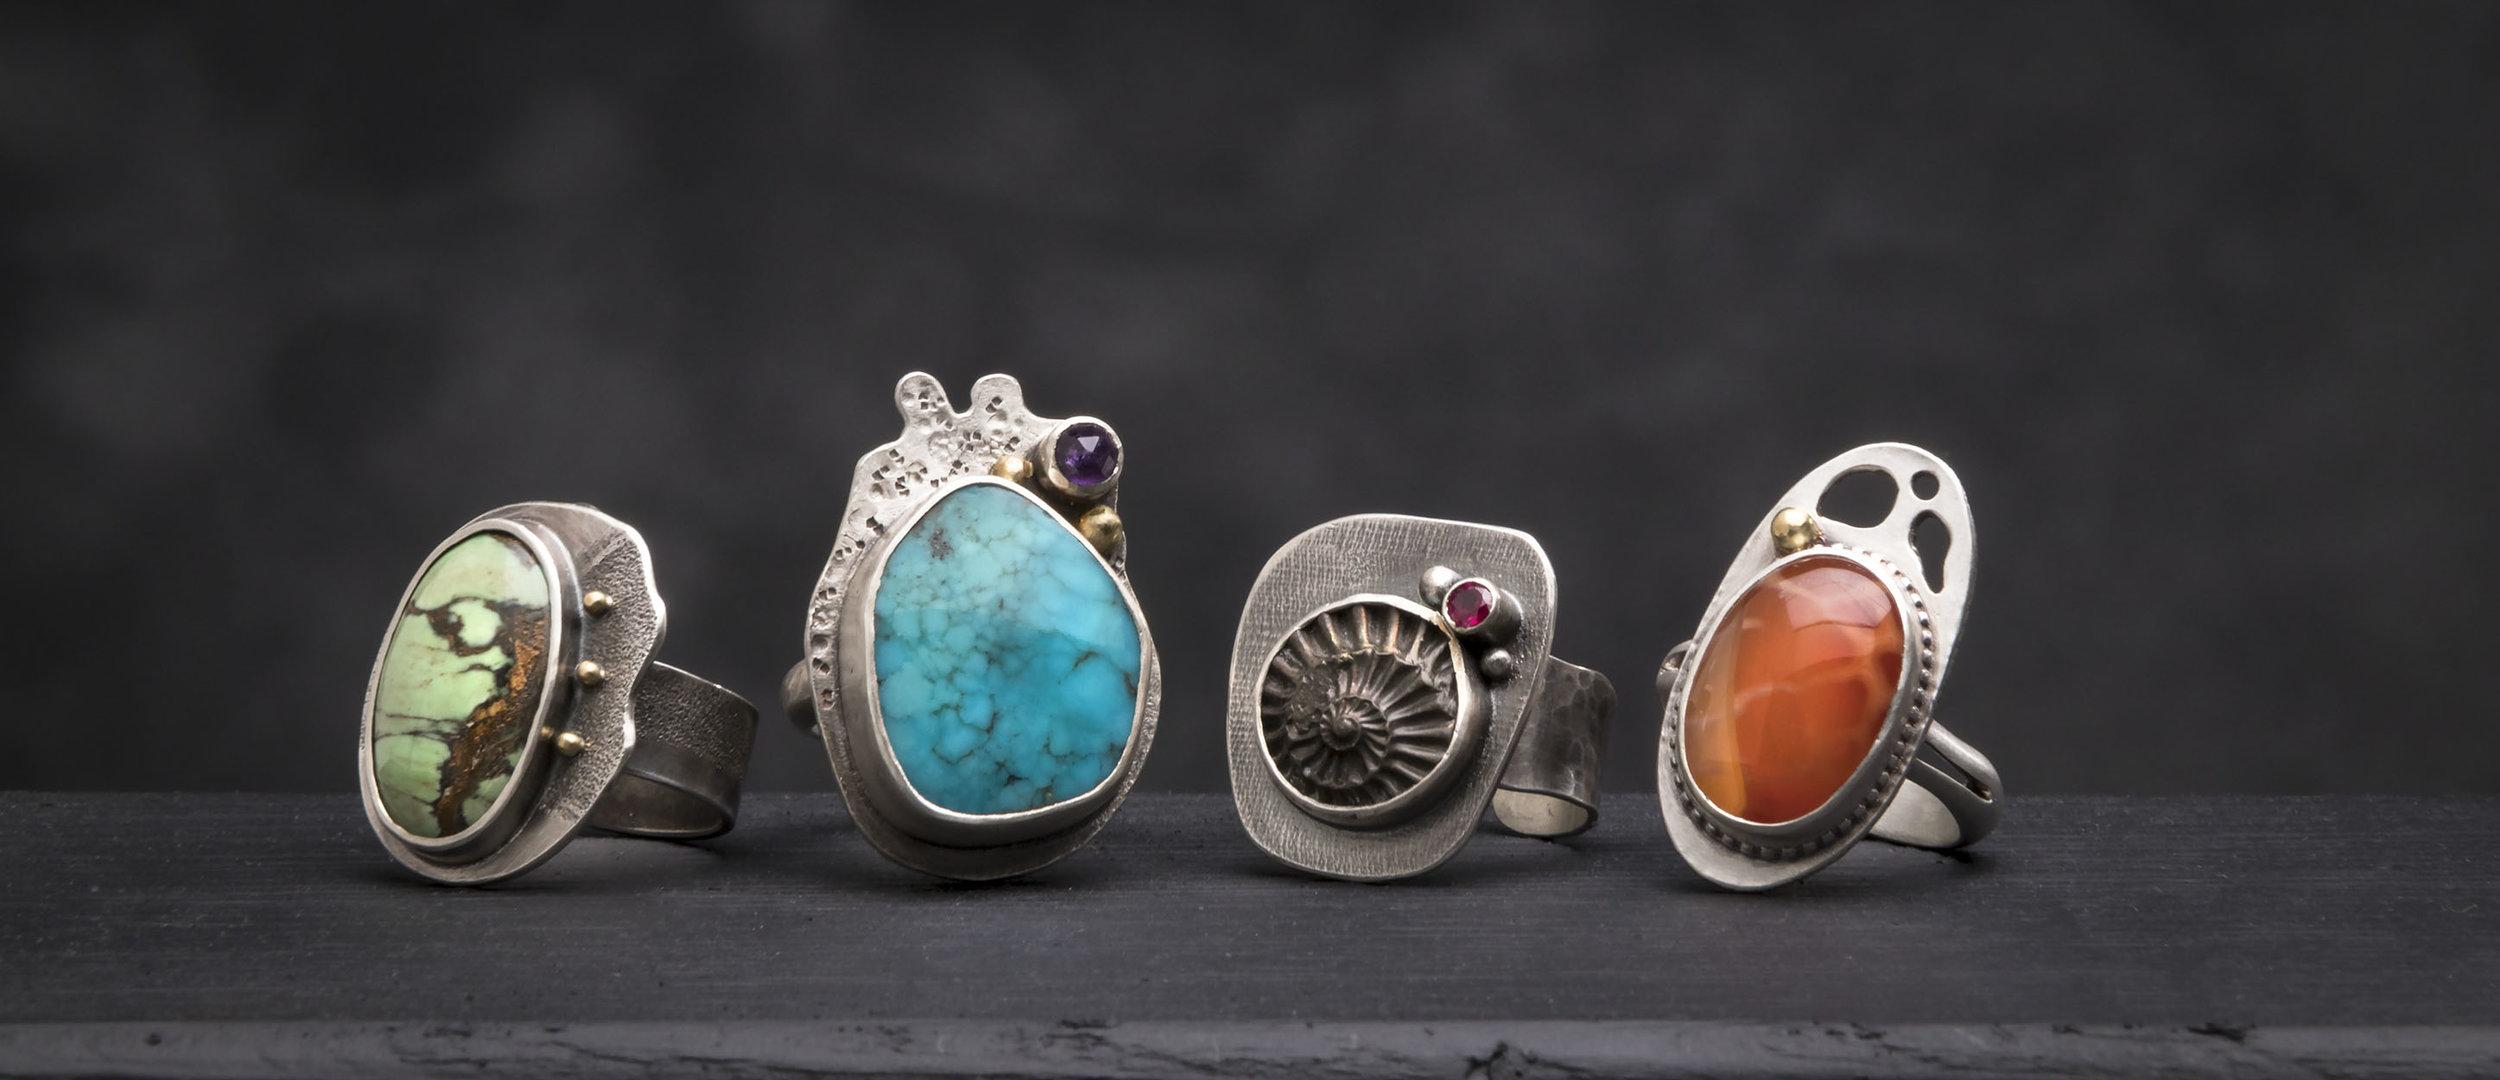 A Quartet of Rings